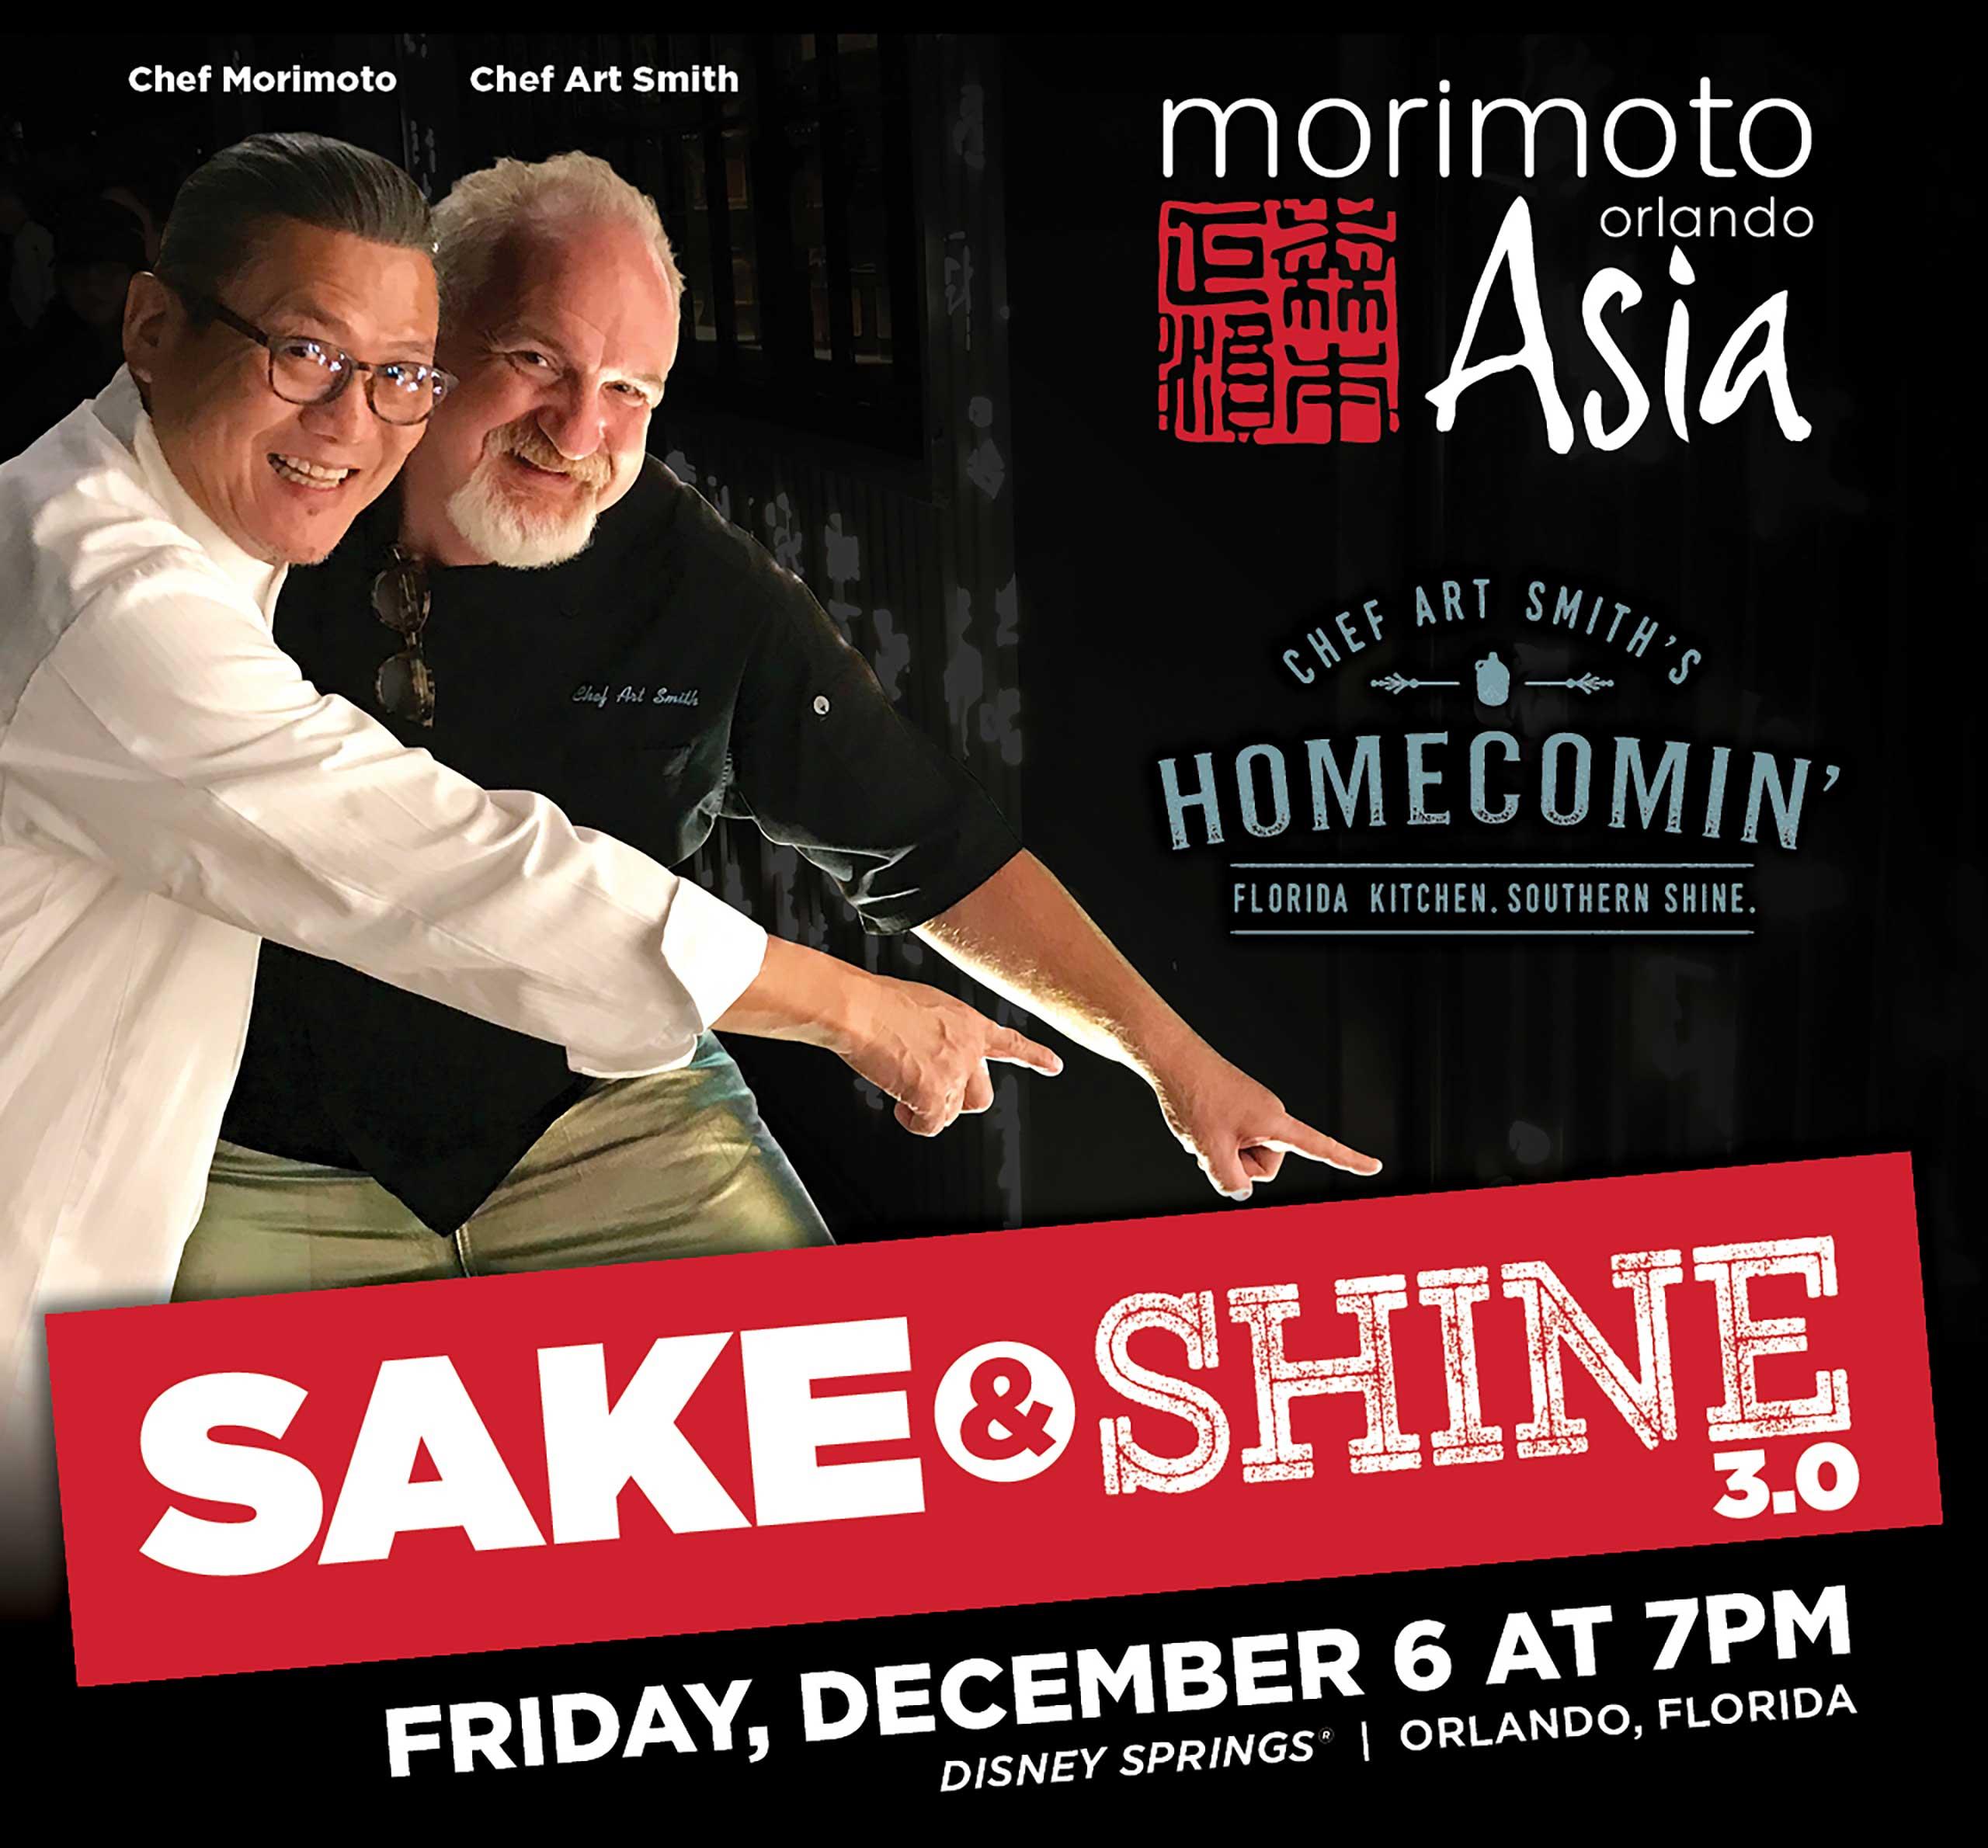 Celebrity chefs Masaharu Morimoto and Art Smith to host Sake and Shine 3.0 at Disney Springs